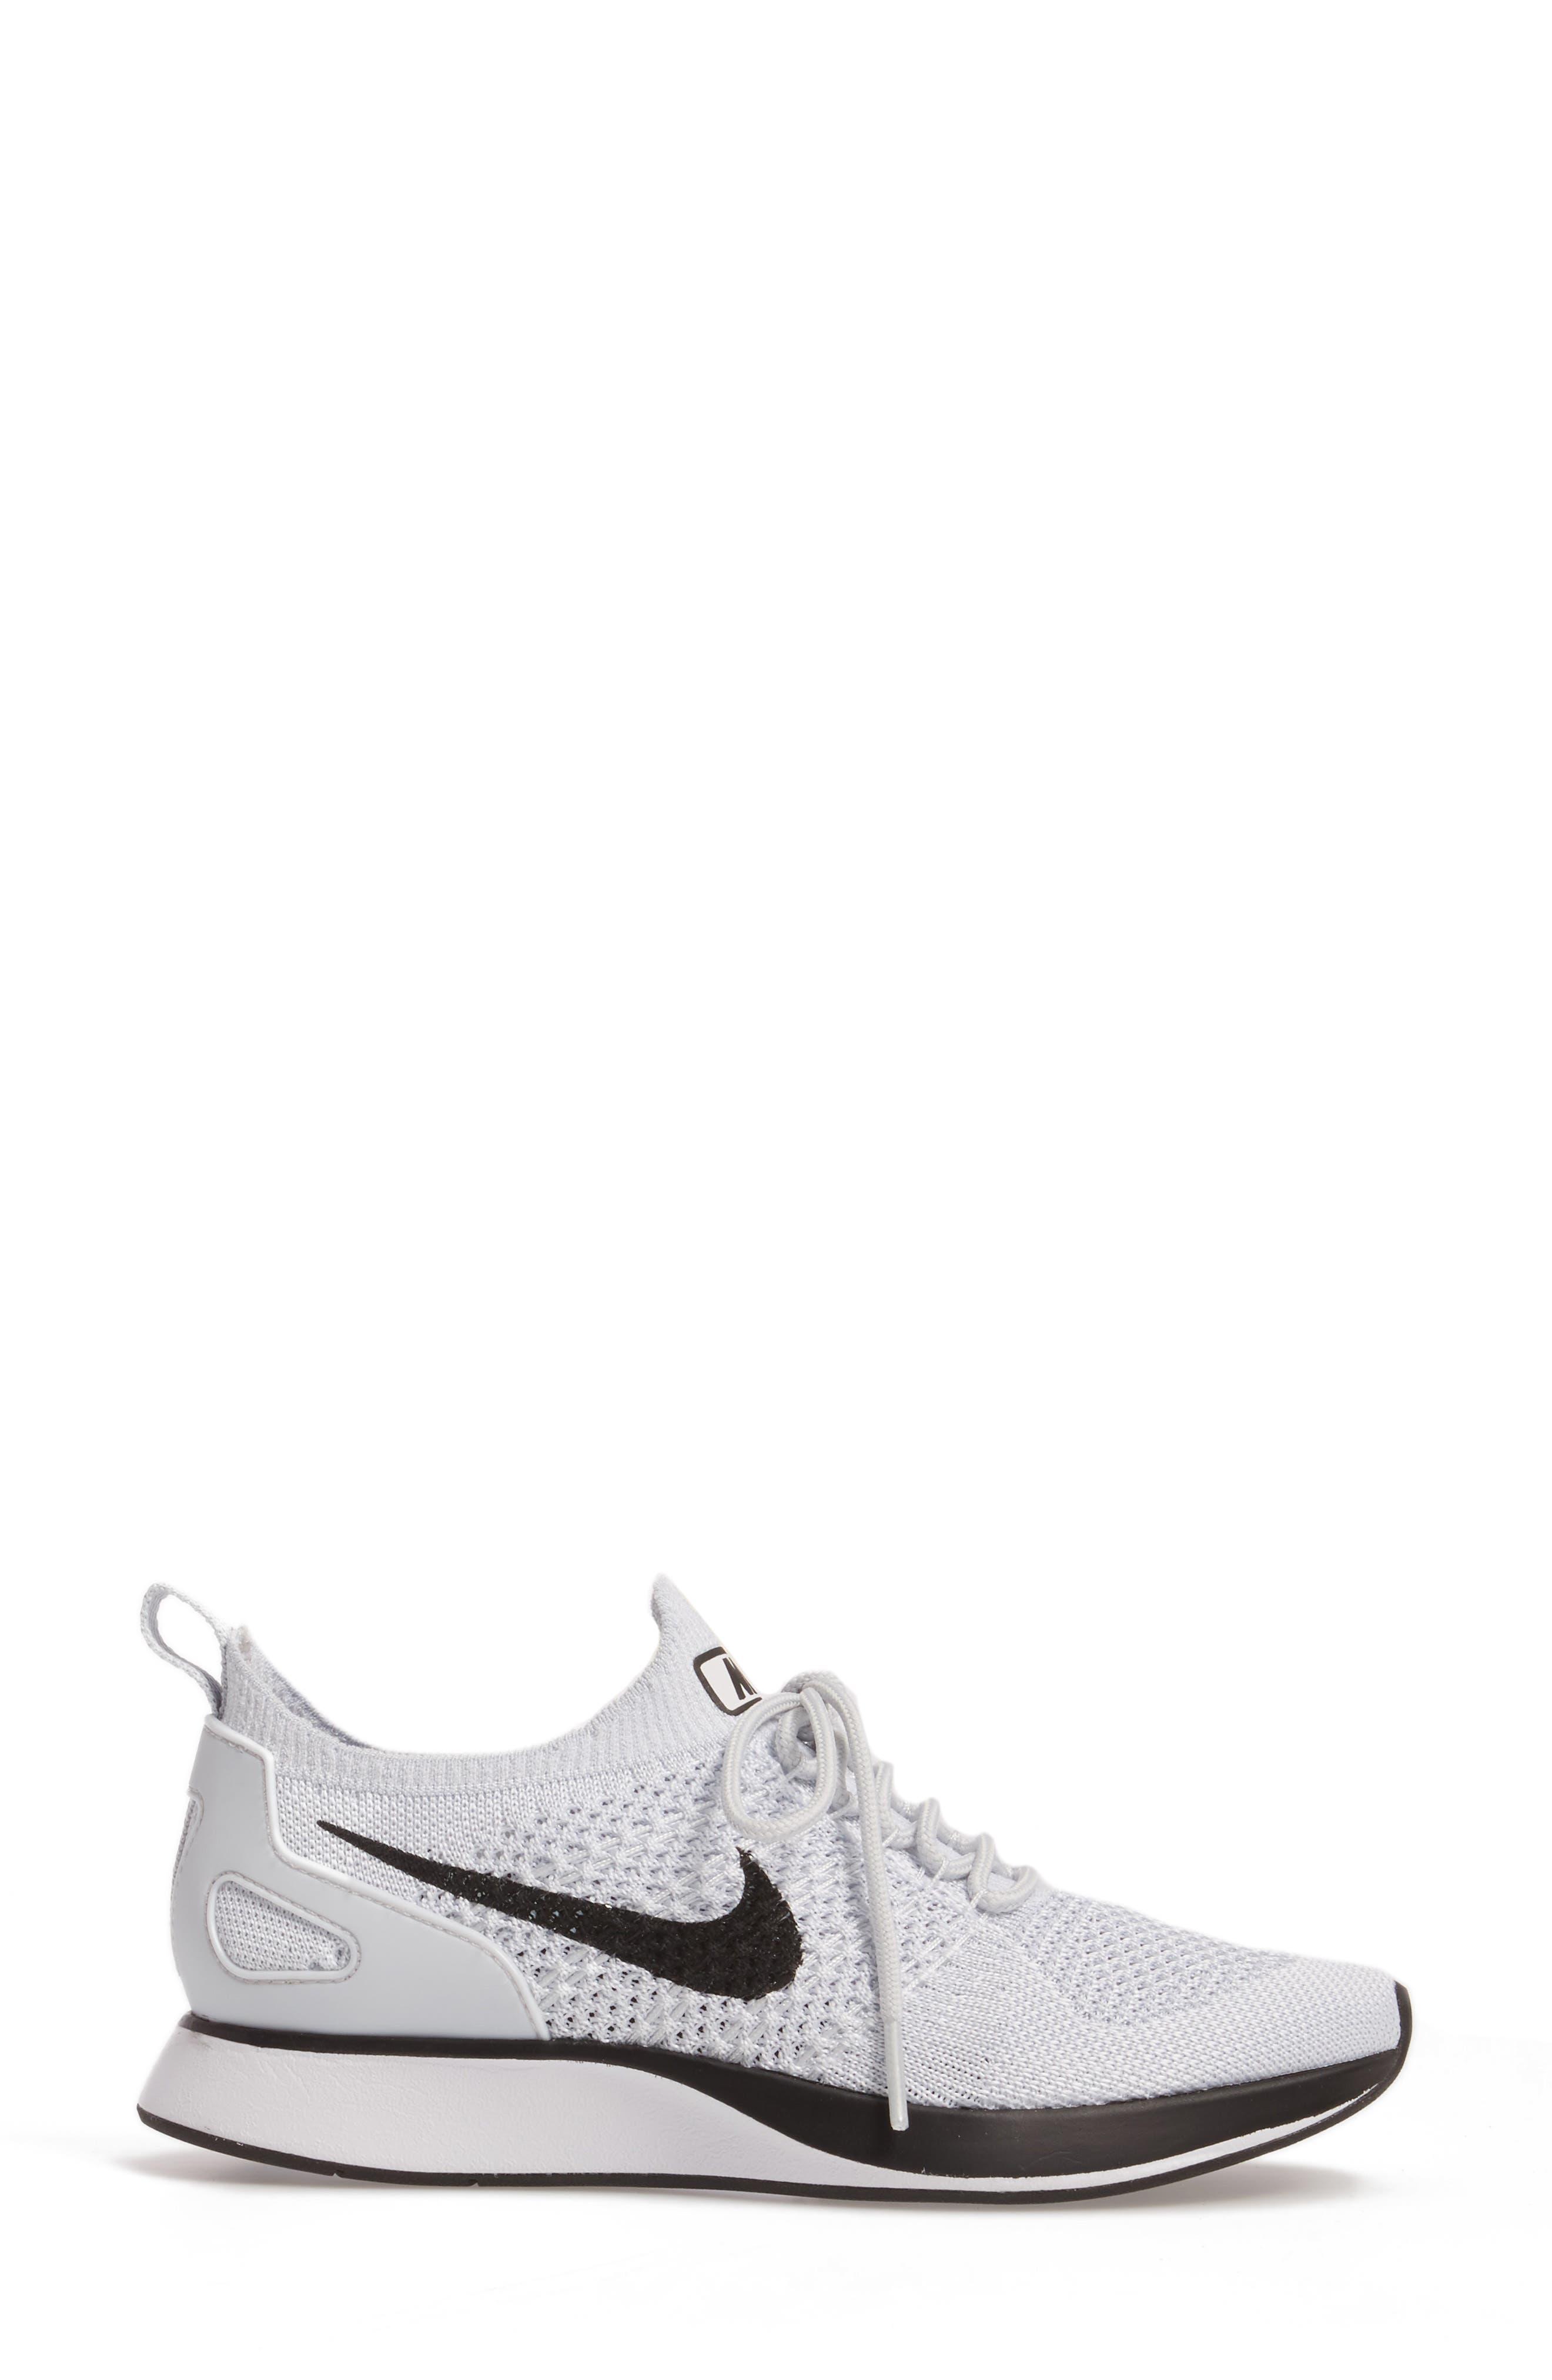 Alternate Image 3  - Nike Zoom Mariah Flyknit Racer Premium Sneaker (Women)